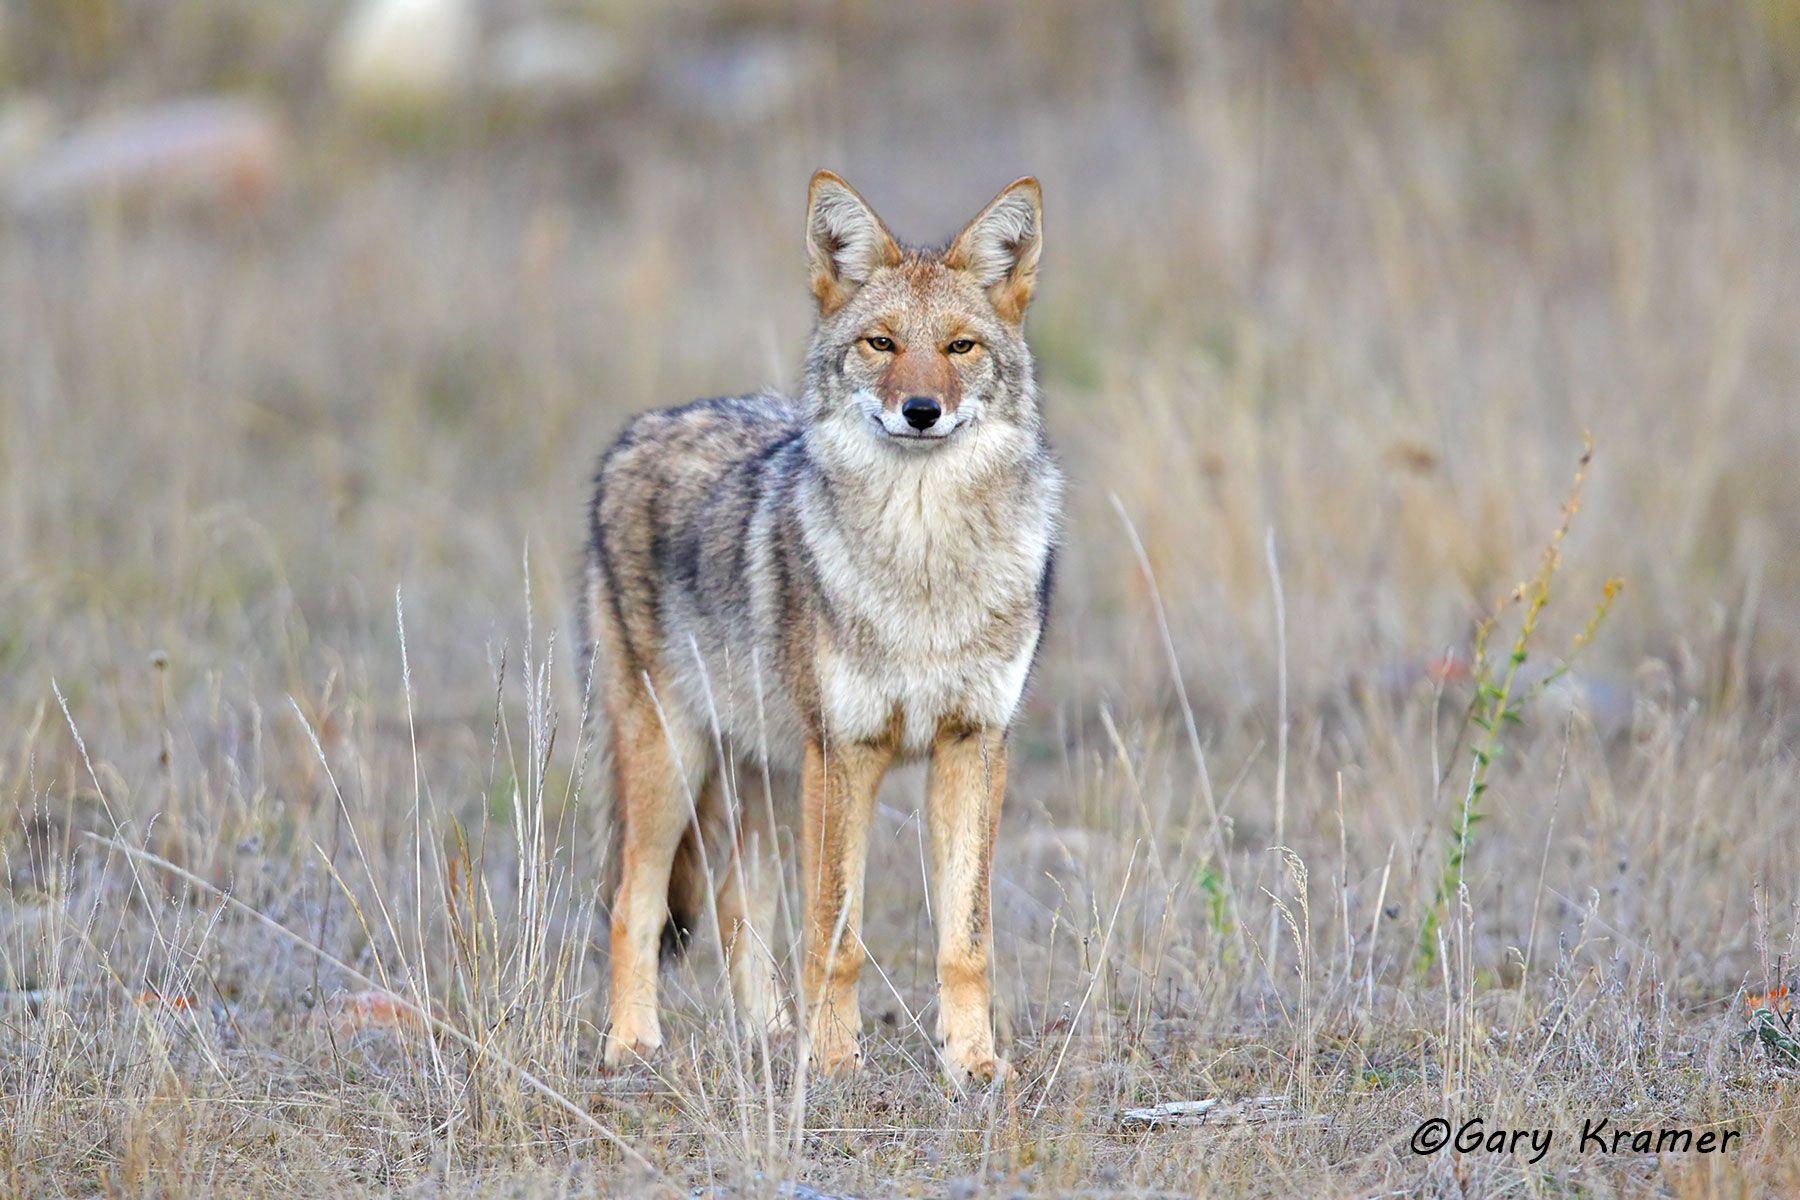 Coyote (Canis latrans) - NMC#1192d